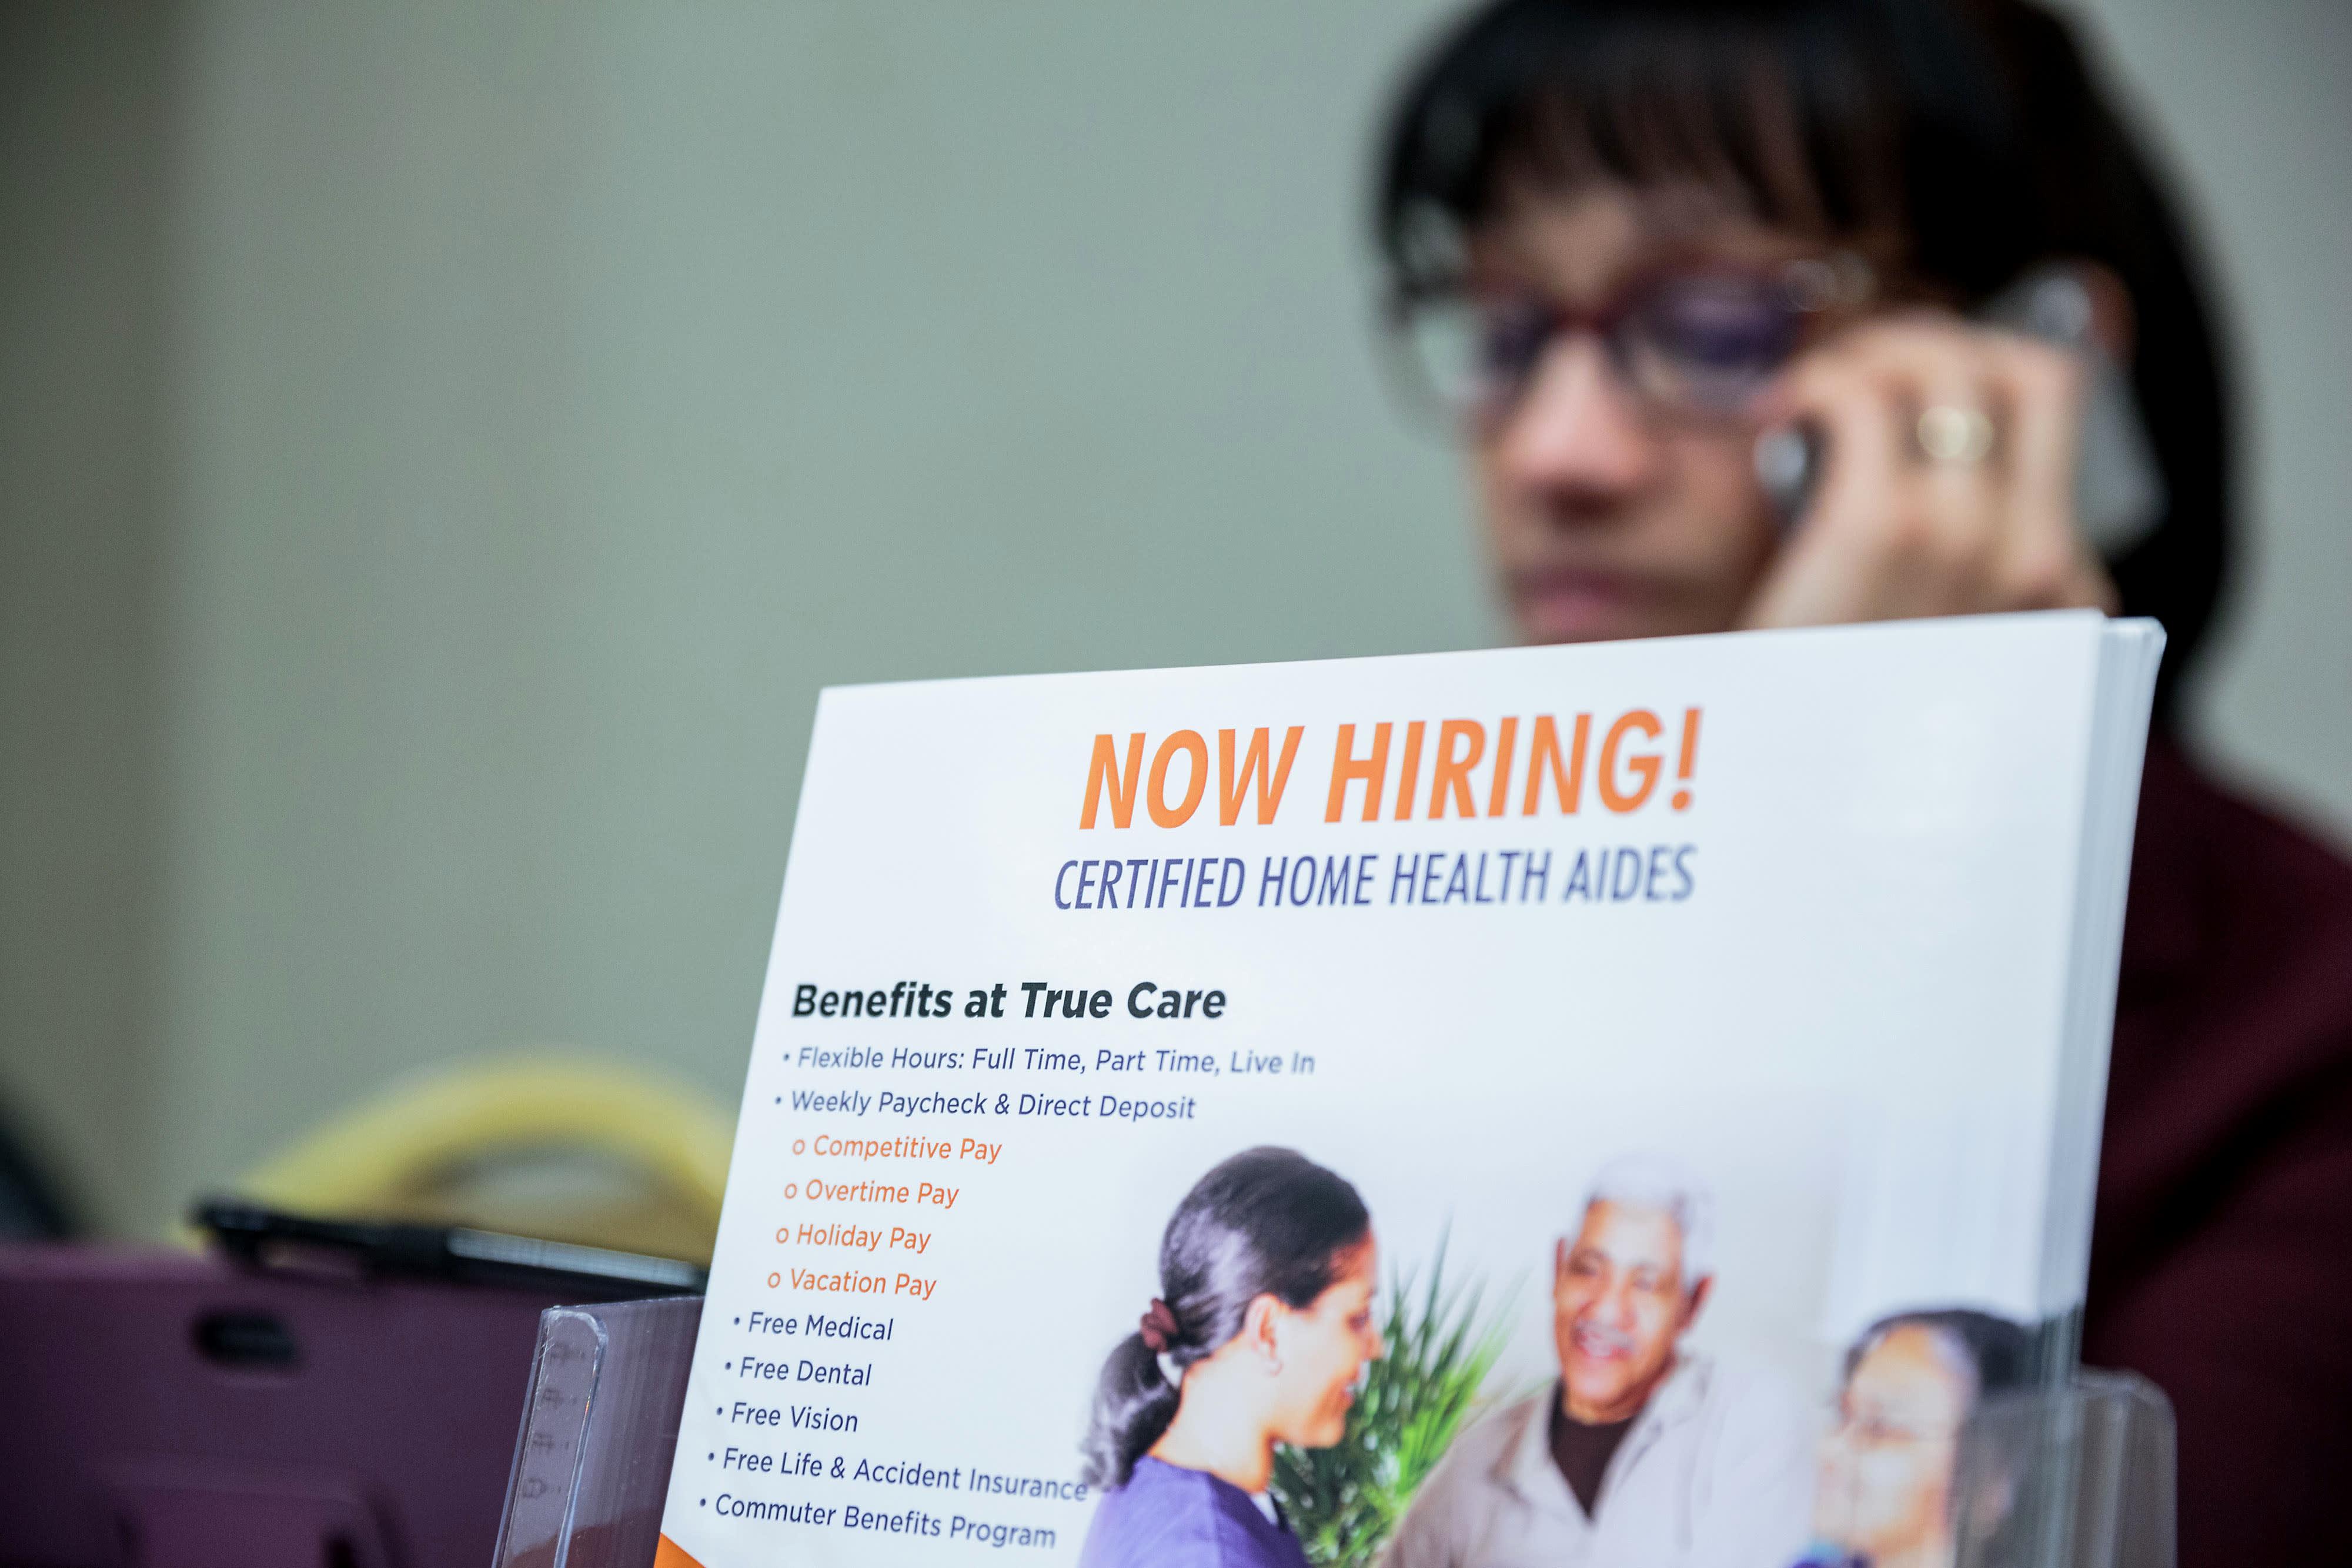 US Jobs Report November 2019: 266,000 payrolls added, 3.5% unemployment